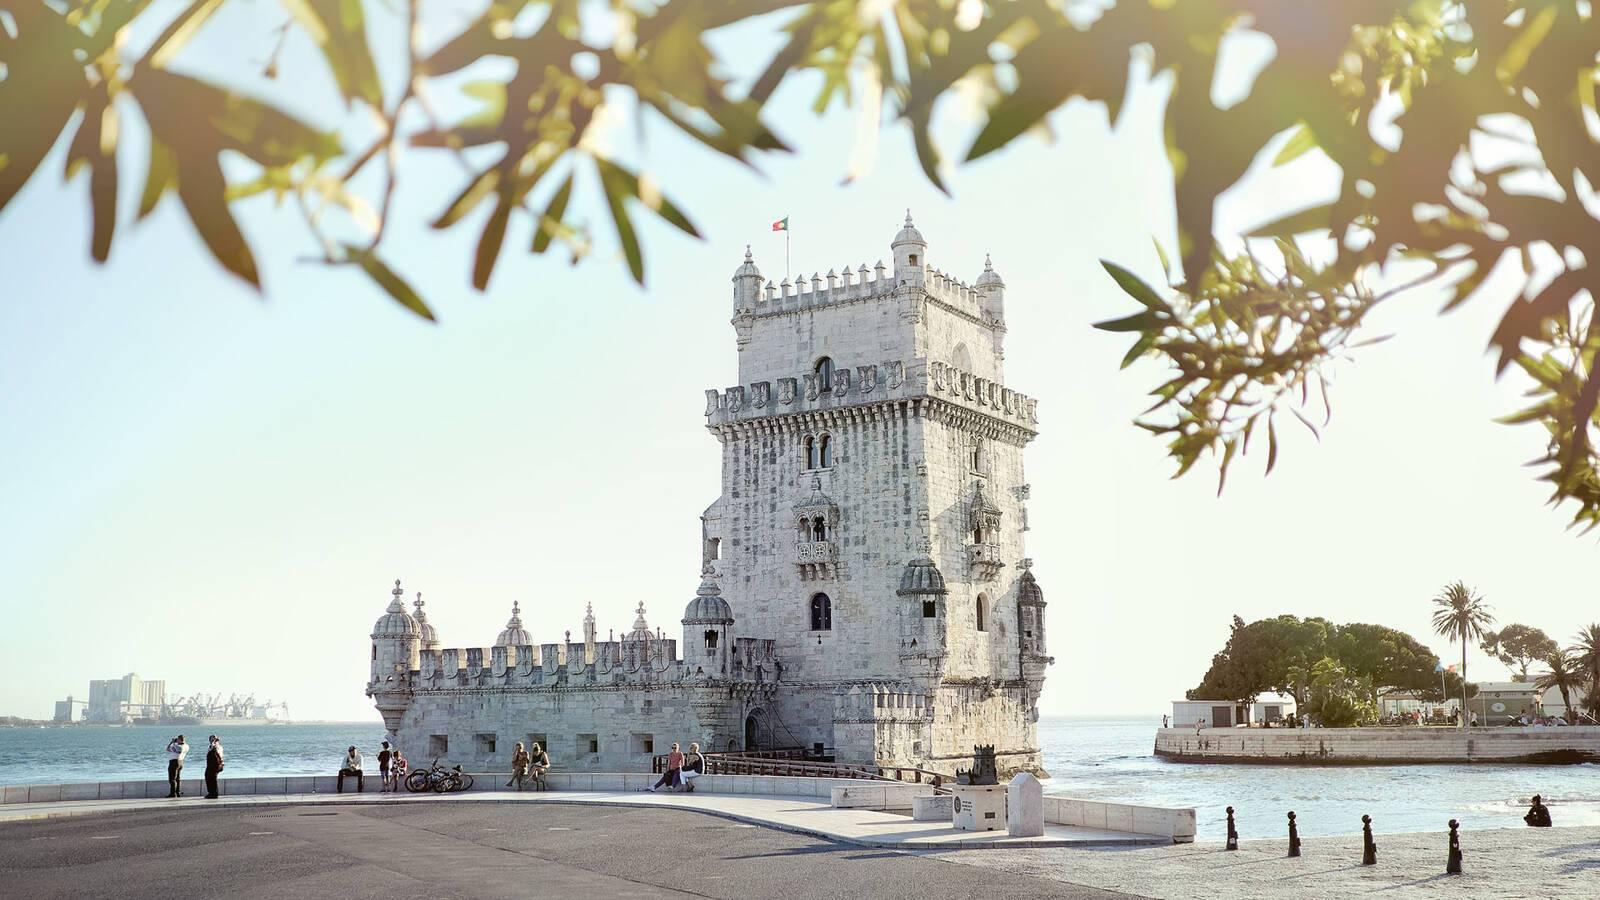 Lisbonnne Belm alex paganelli Portugal